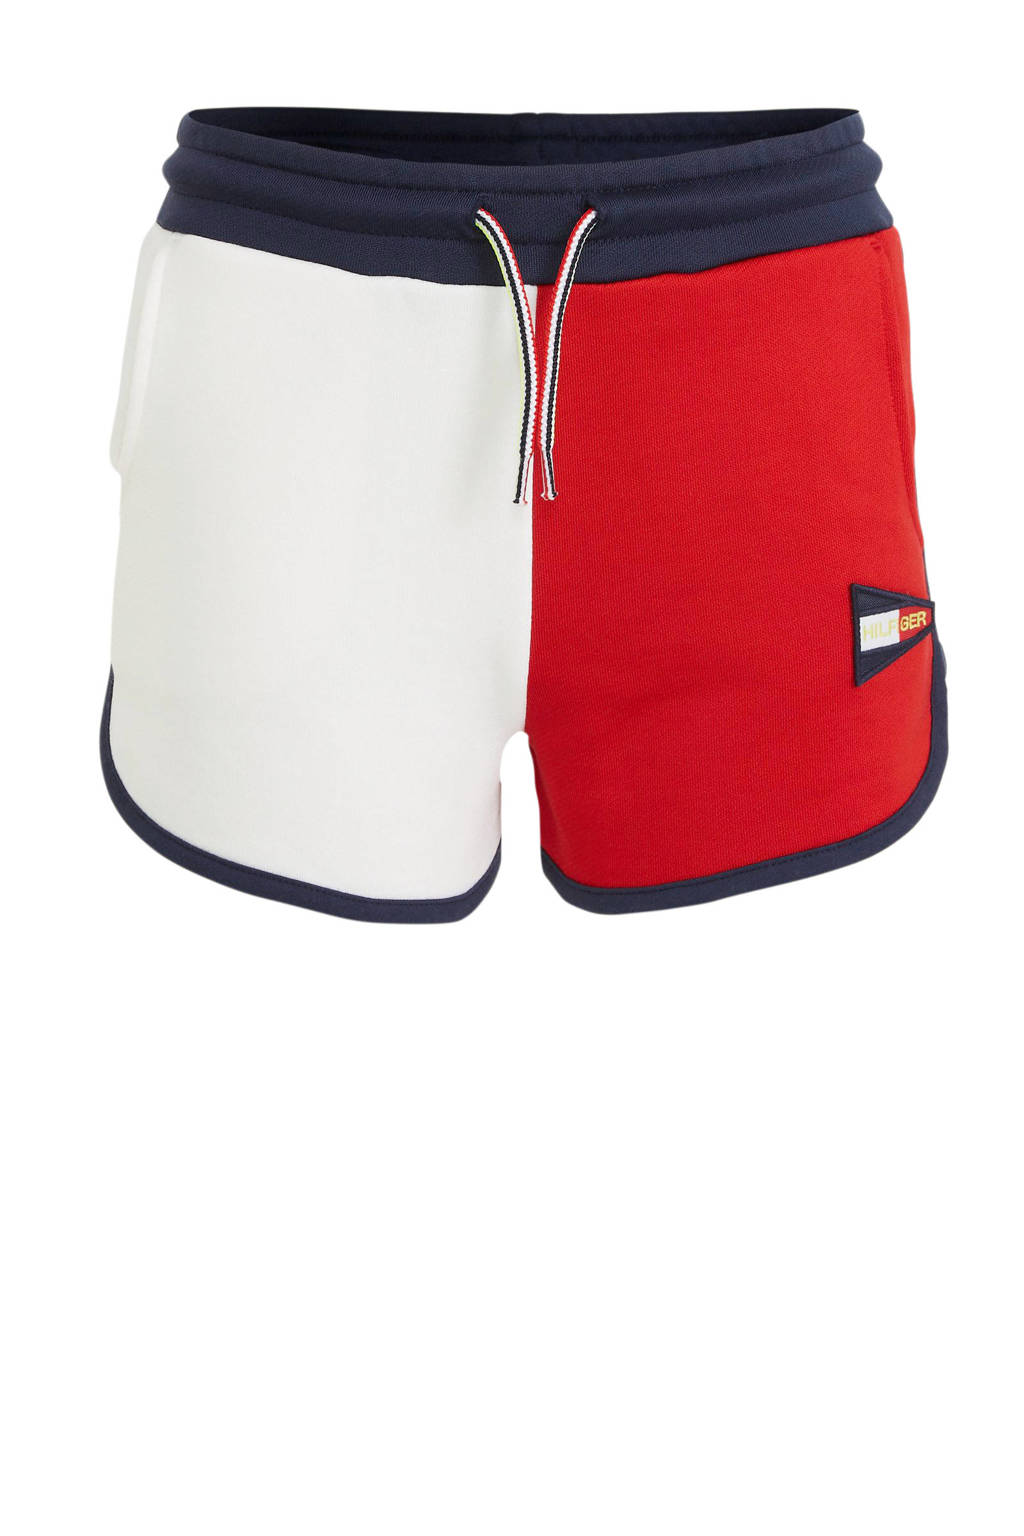 Tommy Hilfiger sweatshort met borduursels rood/donkerblauw/wit, Rood/donkerblauw/wit